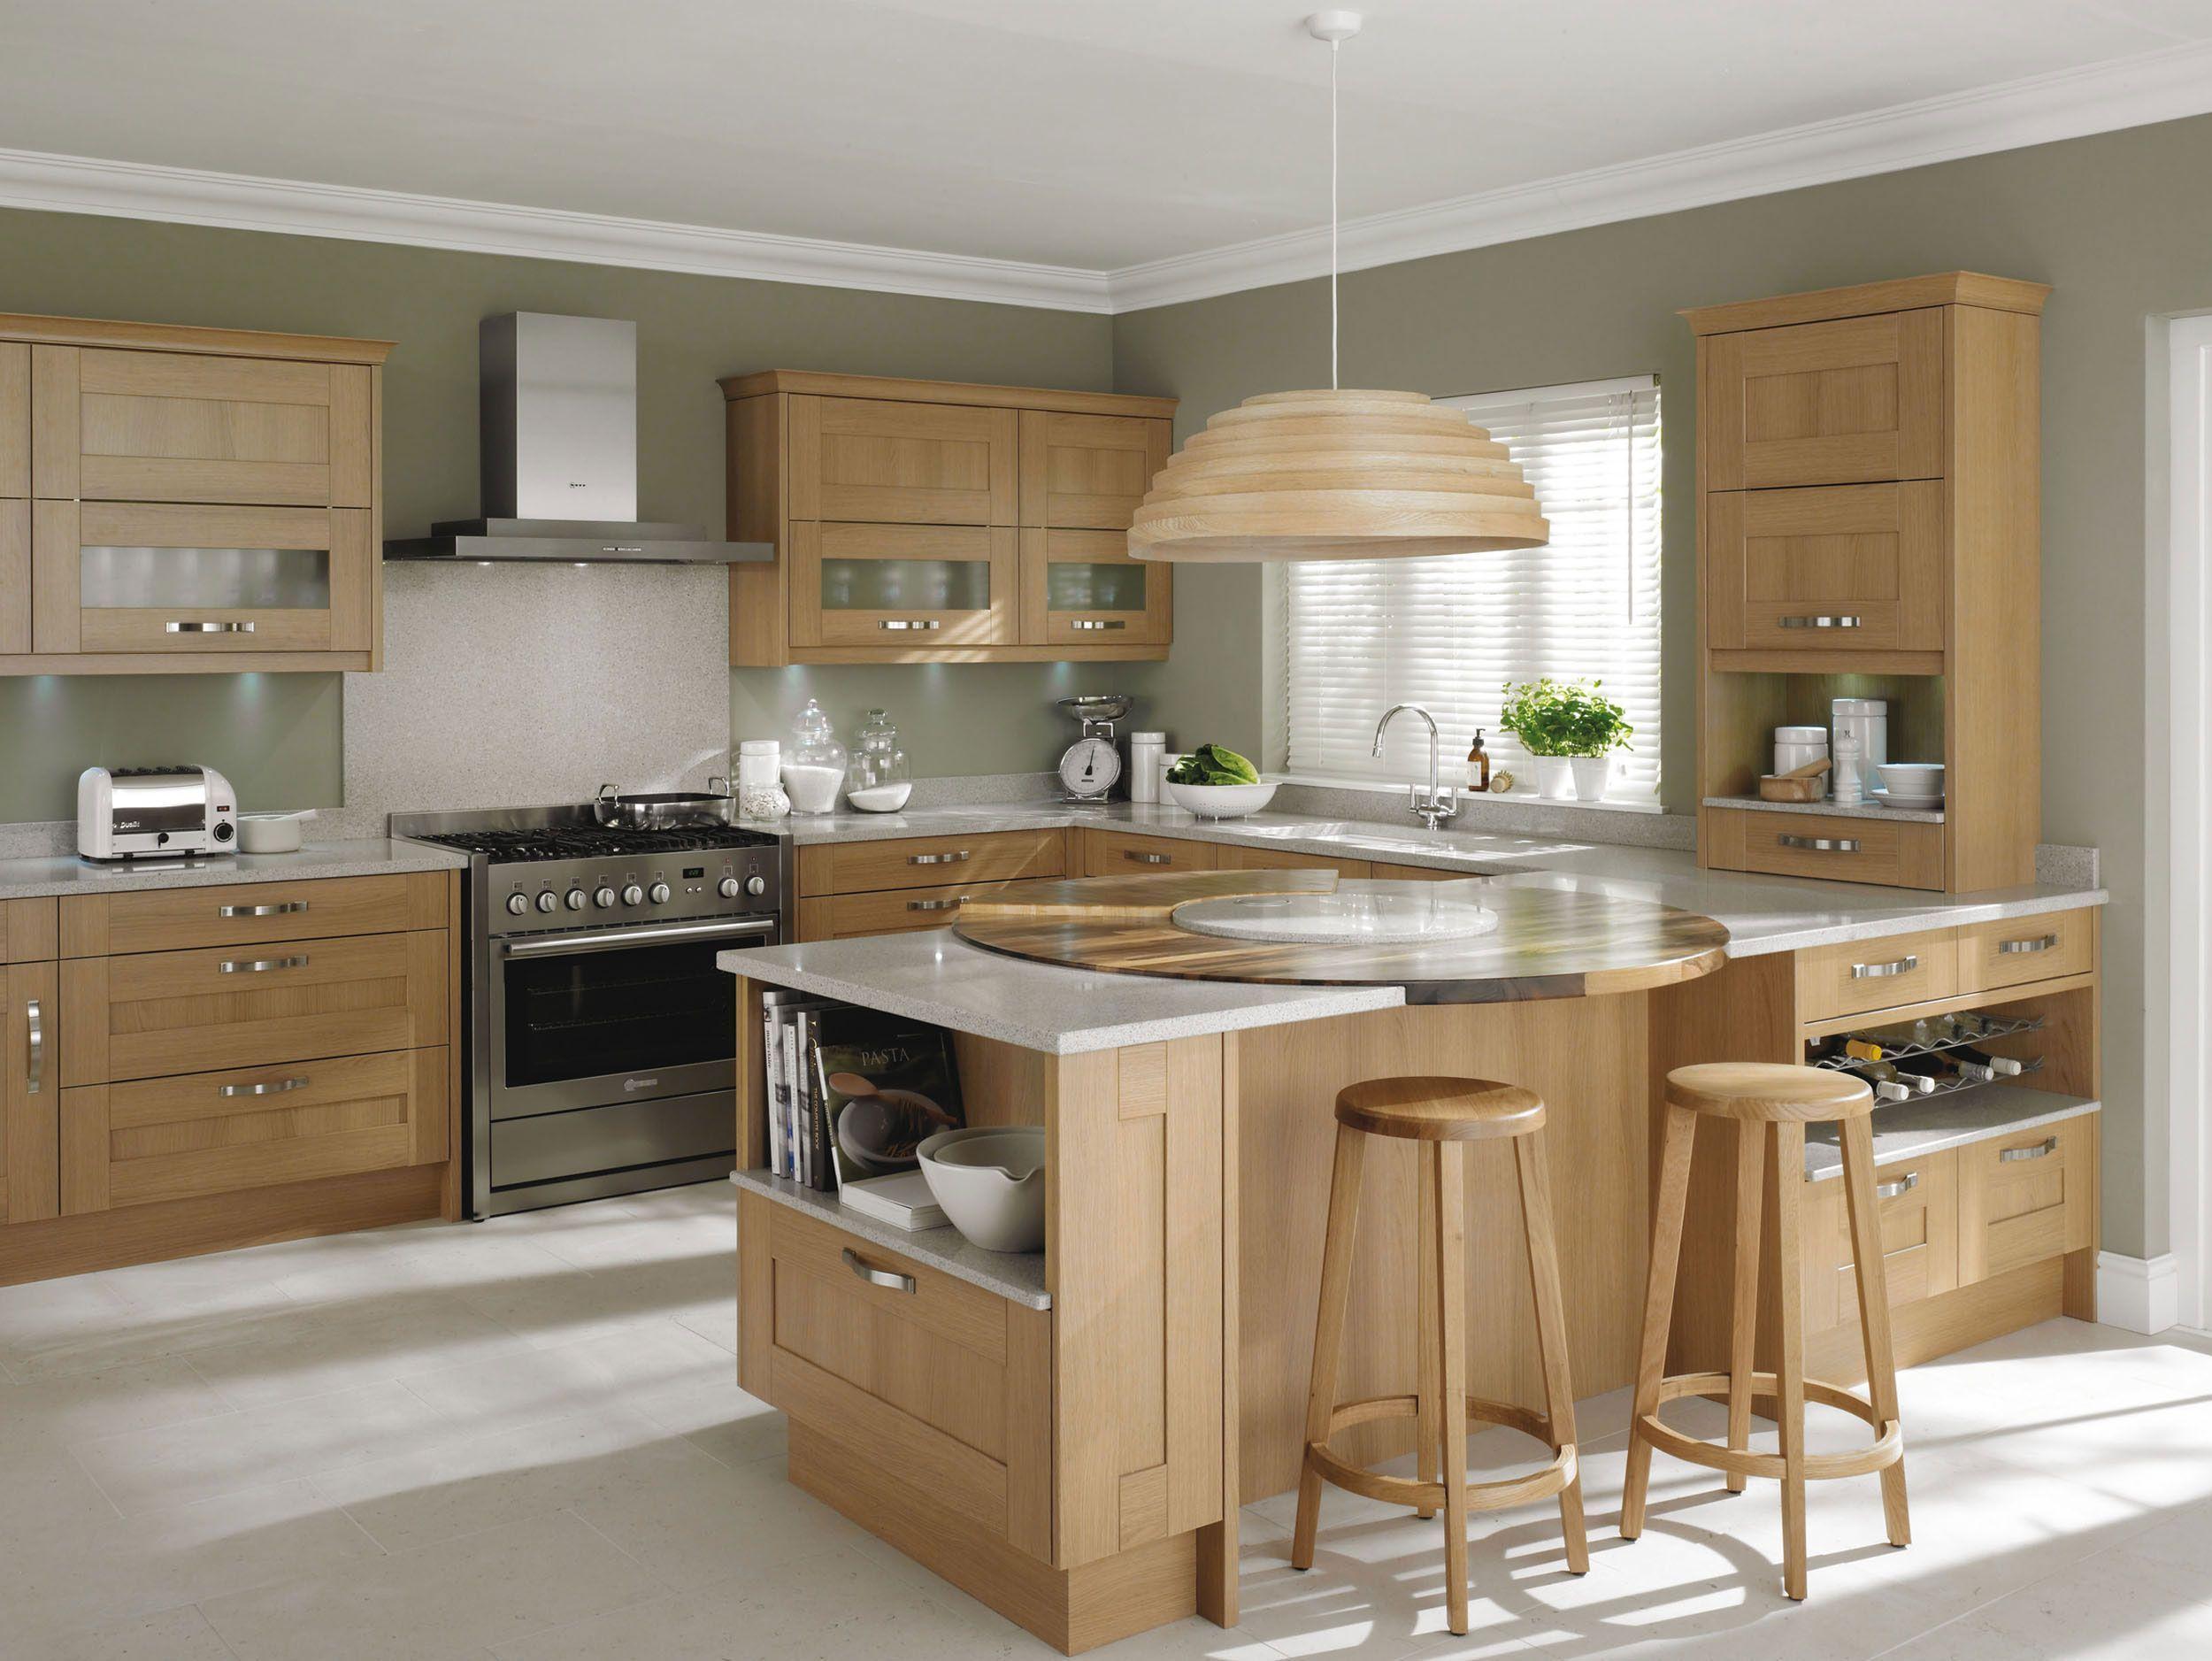 Modern Style Cozy Wooden Kitchen Design Ideas Reclaimedwoodkitchenislandideas Backsplashdecorhood Kitchen Island Cabinets Kitchen Design Contemporary Kitchen